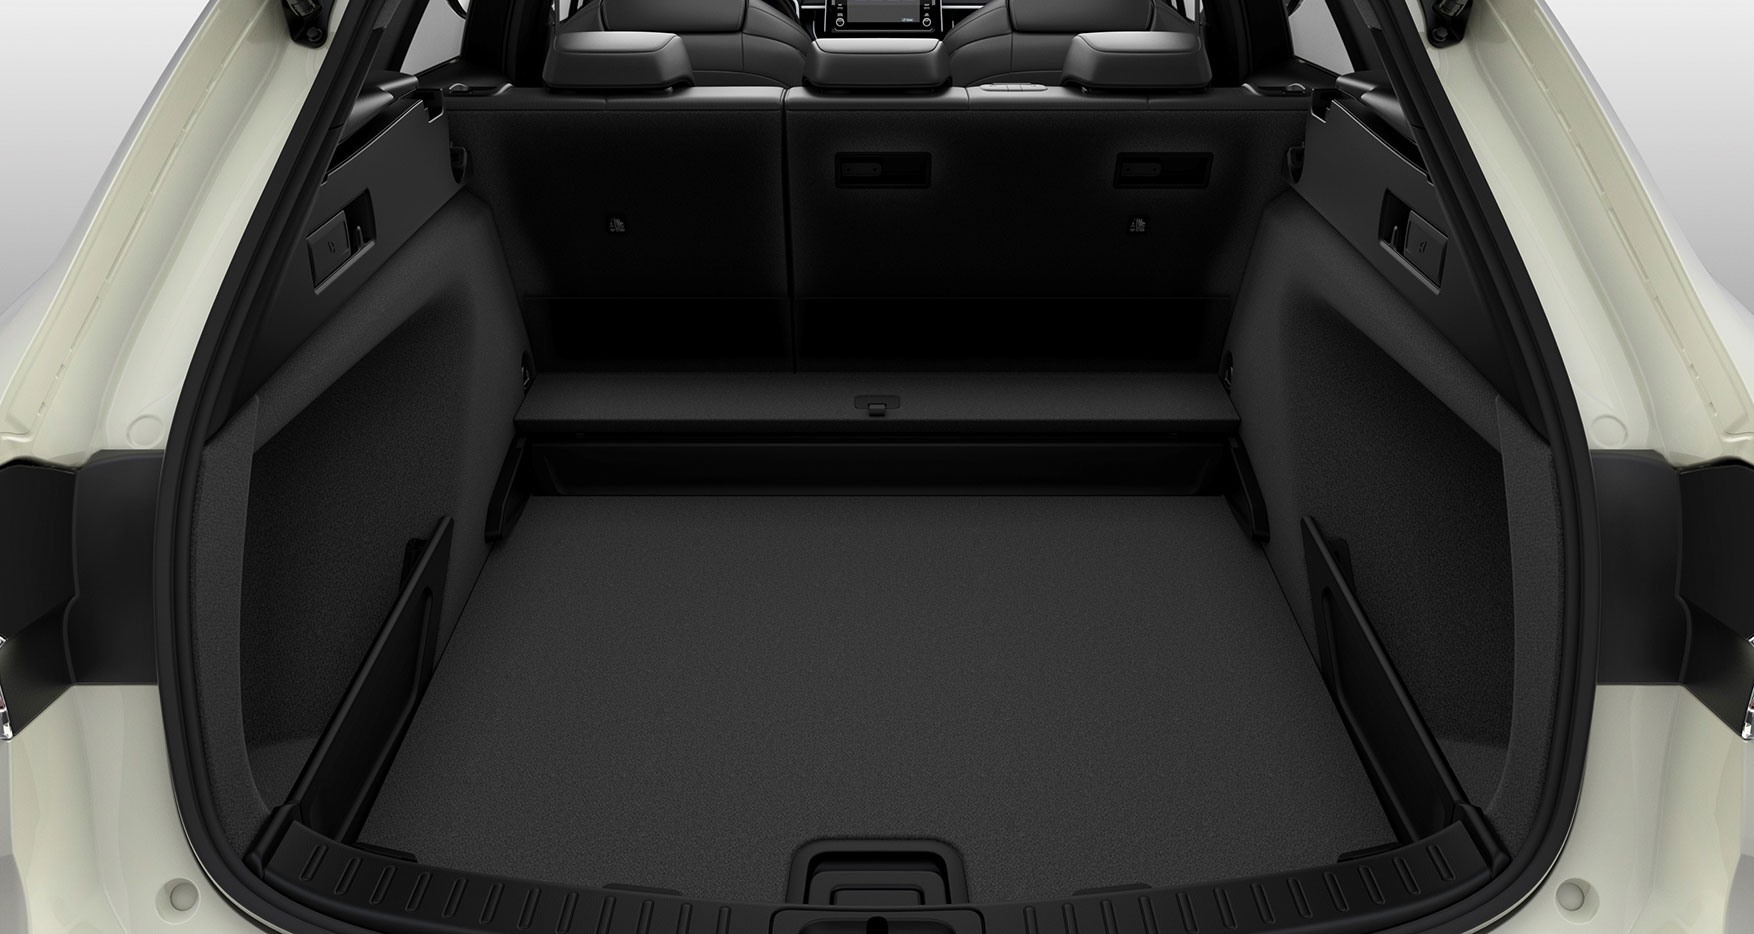 Suzuki Swace 2020 - 2-way deck board in lower position